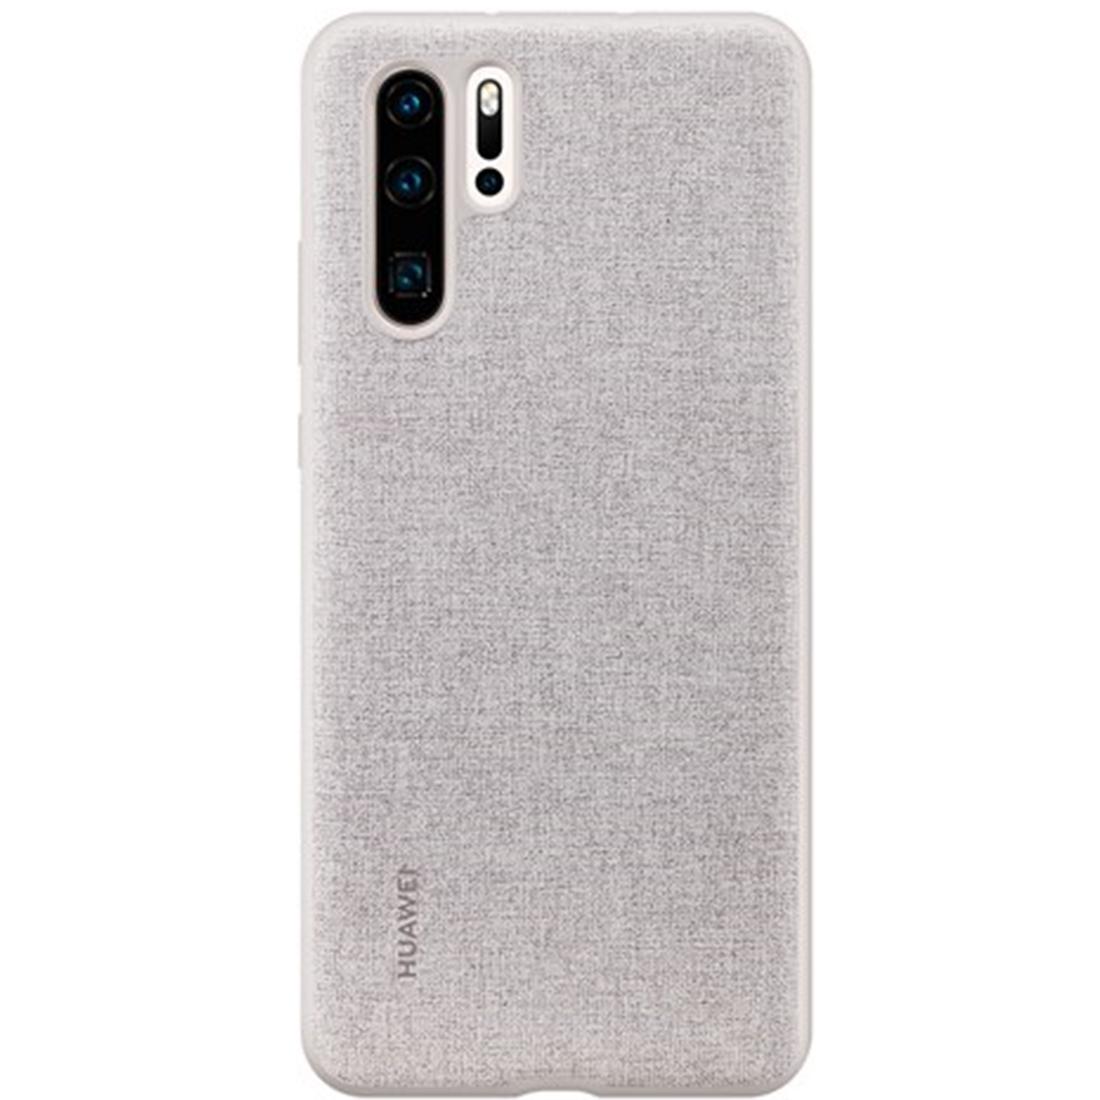 Capac protectie spate Huawei PU Cover pentru Huawei P30 Pro Elegant Gray